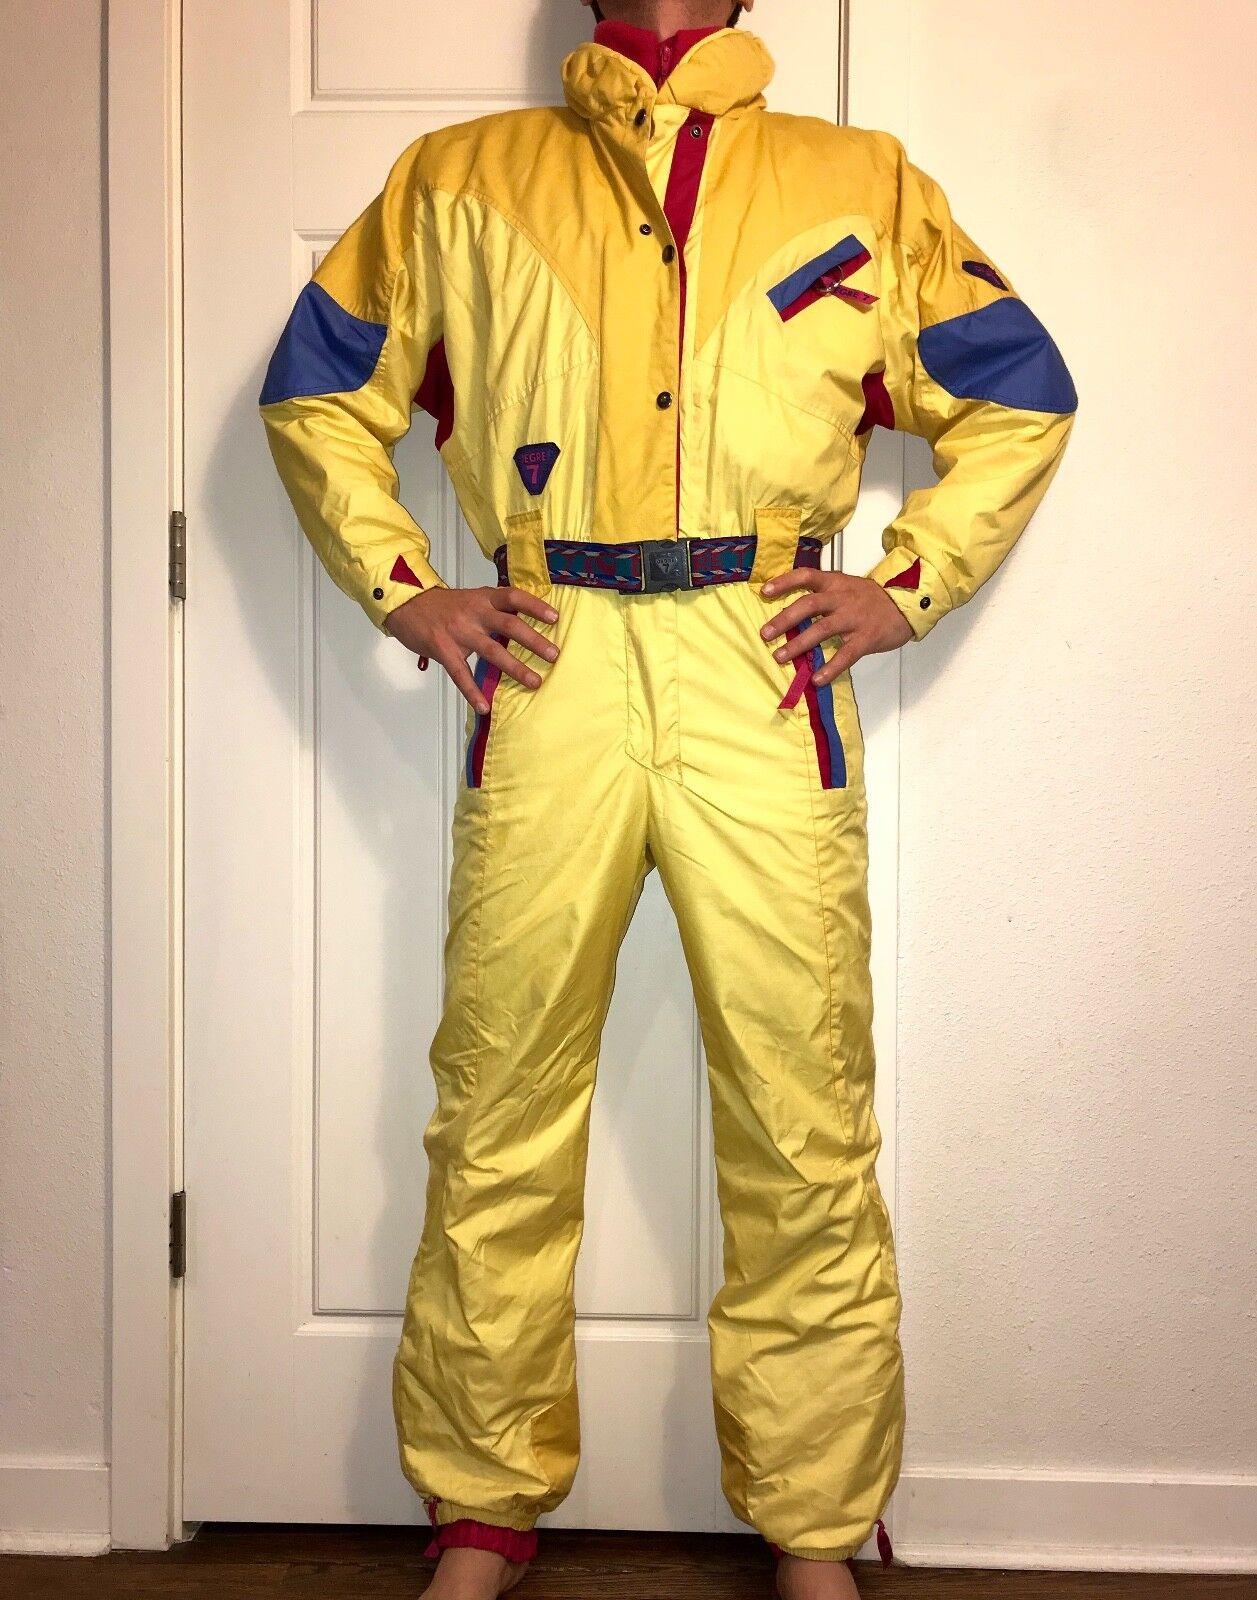 Vtg  80s 90s Yellow DEGRE 7 Womens Medium SKI SUIT One Piece Snow Bib Snowsuit 8  no tax